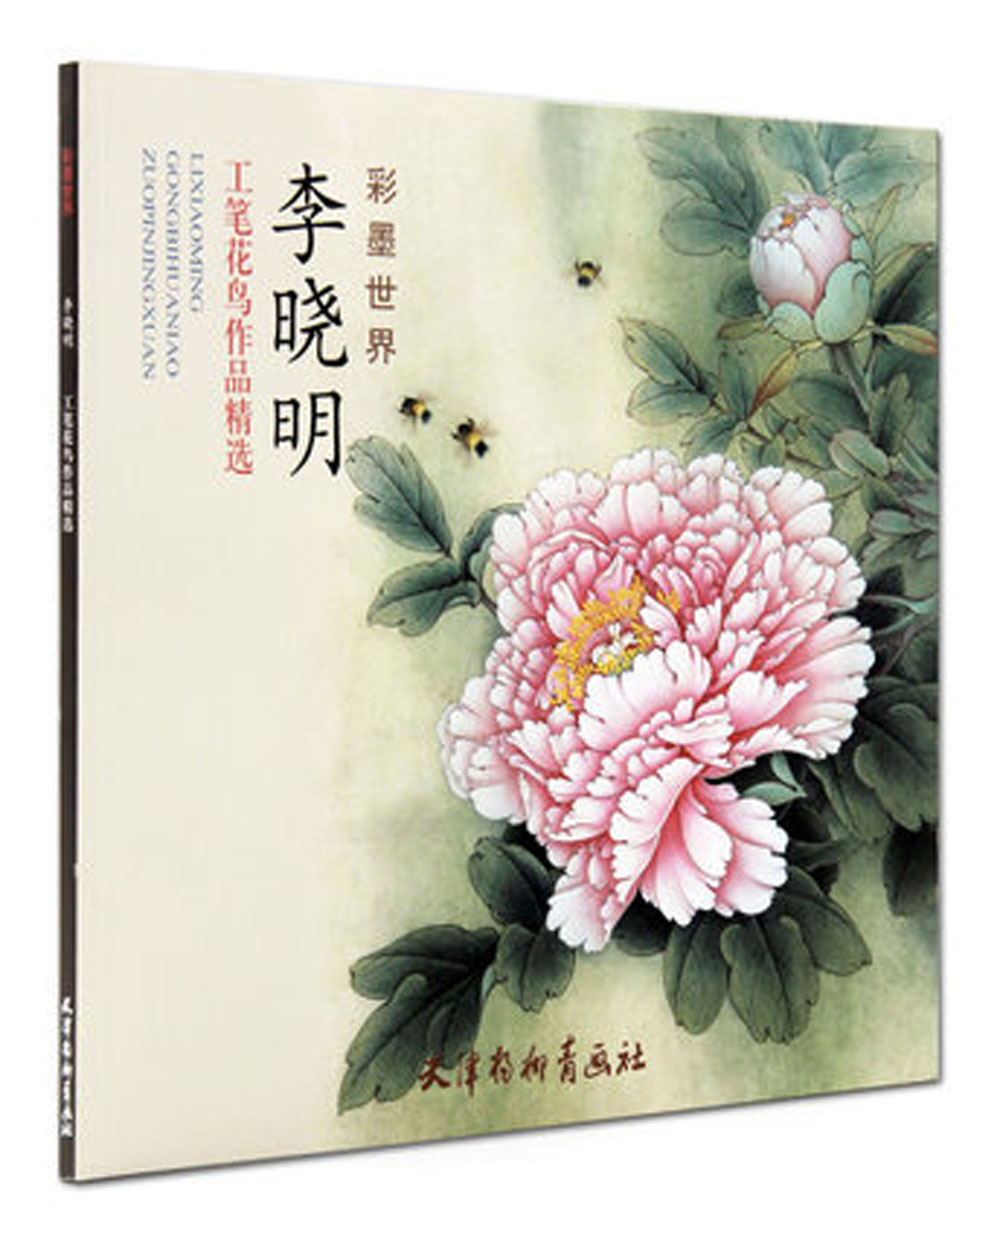 Chinese Flower Painting Art Book By Li Xiaoming Gongbi Peony Lotus